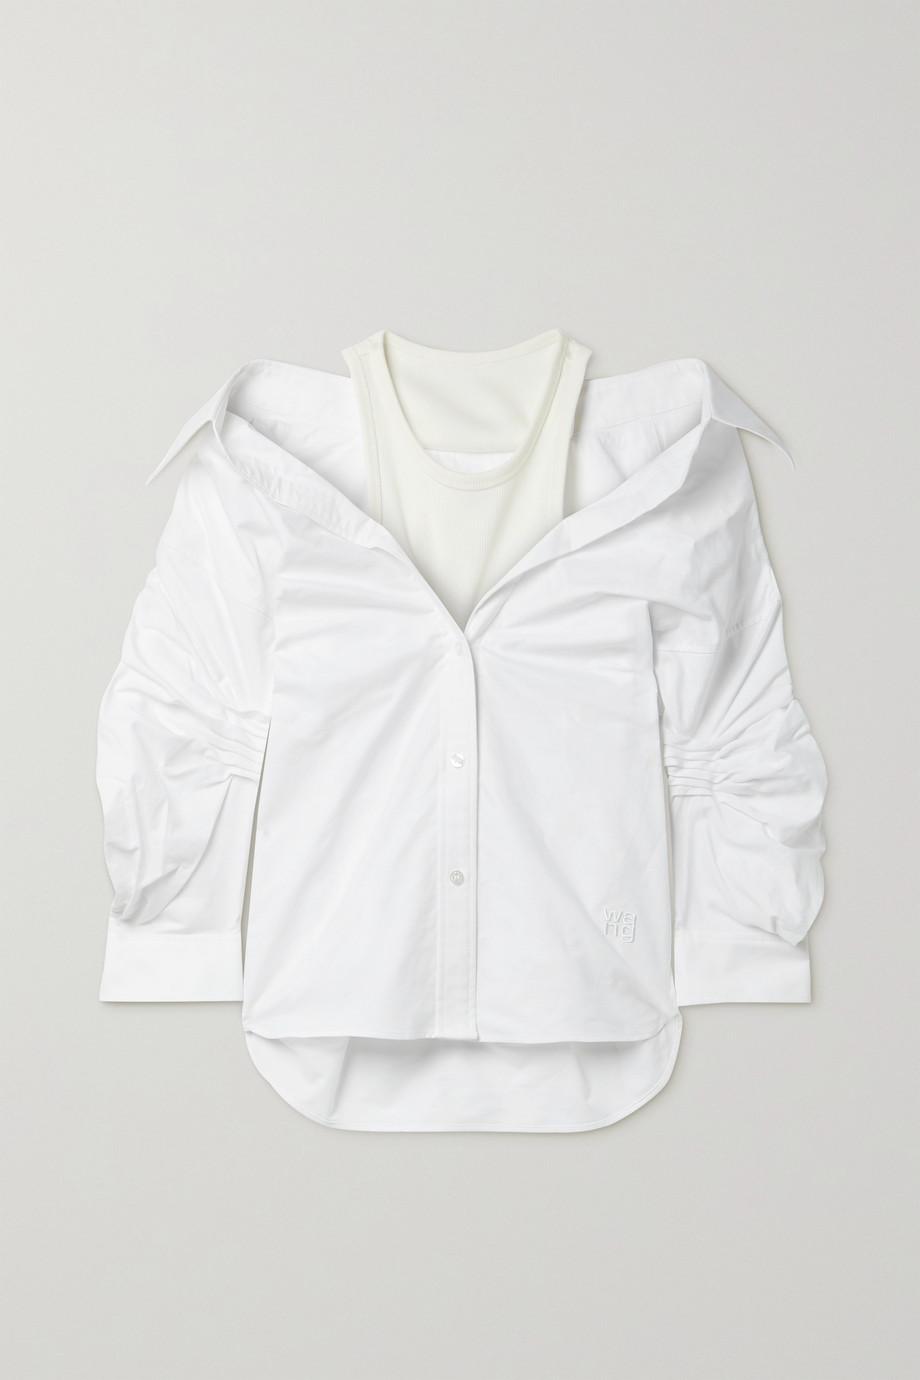 alexanderwang.t 分层式褶饰纯棉牛津纺弹力平纹布衬衫